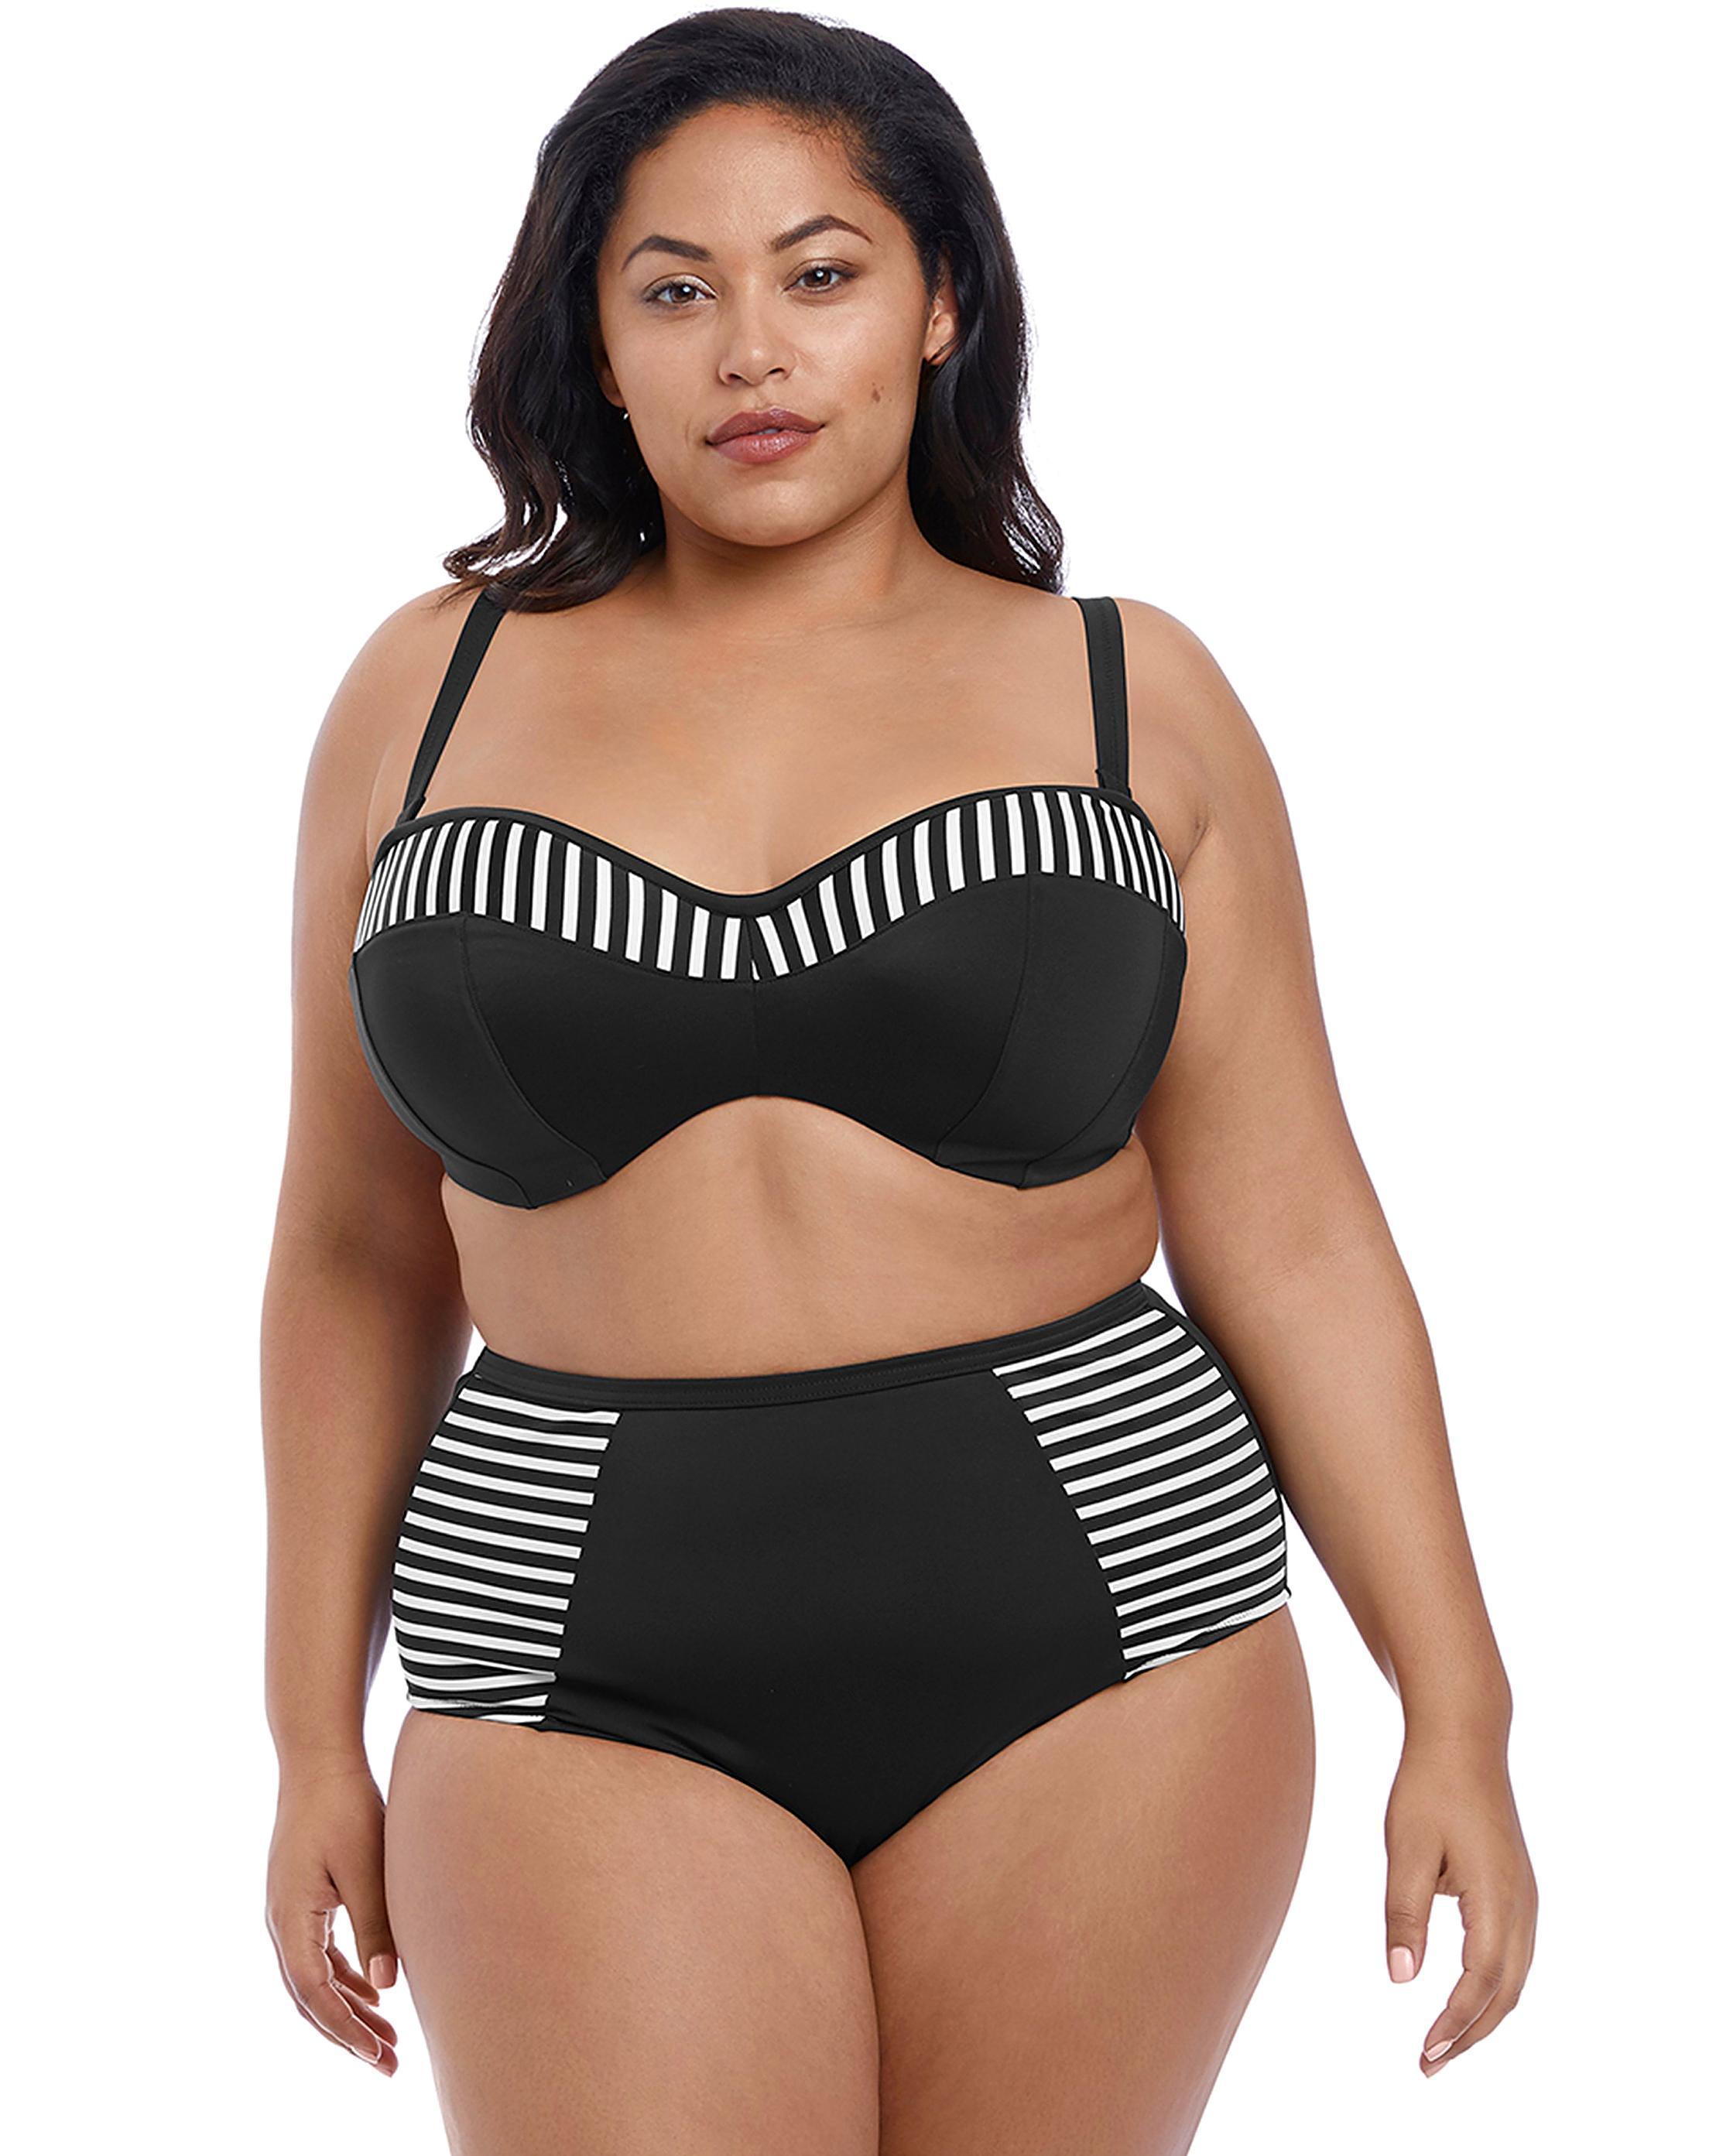 11adf818f33 Lyst - Simply Be Elomi Underwired Bandeau Bikini Top in Black